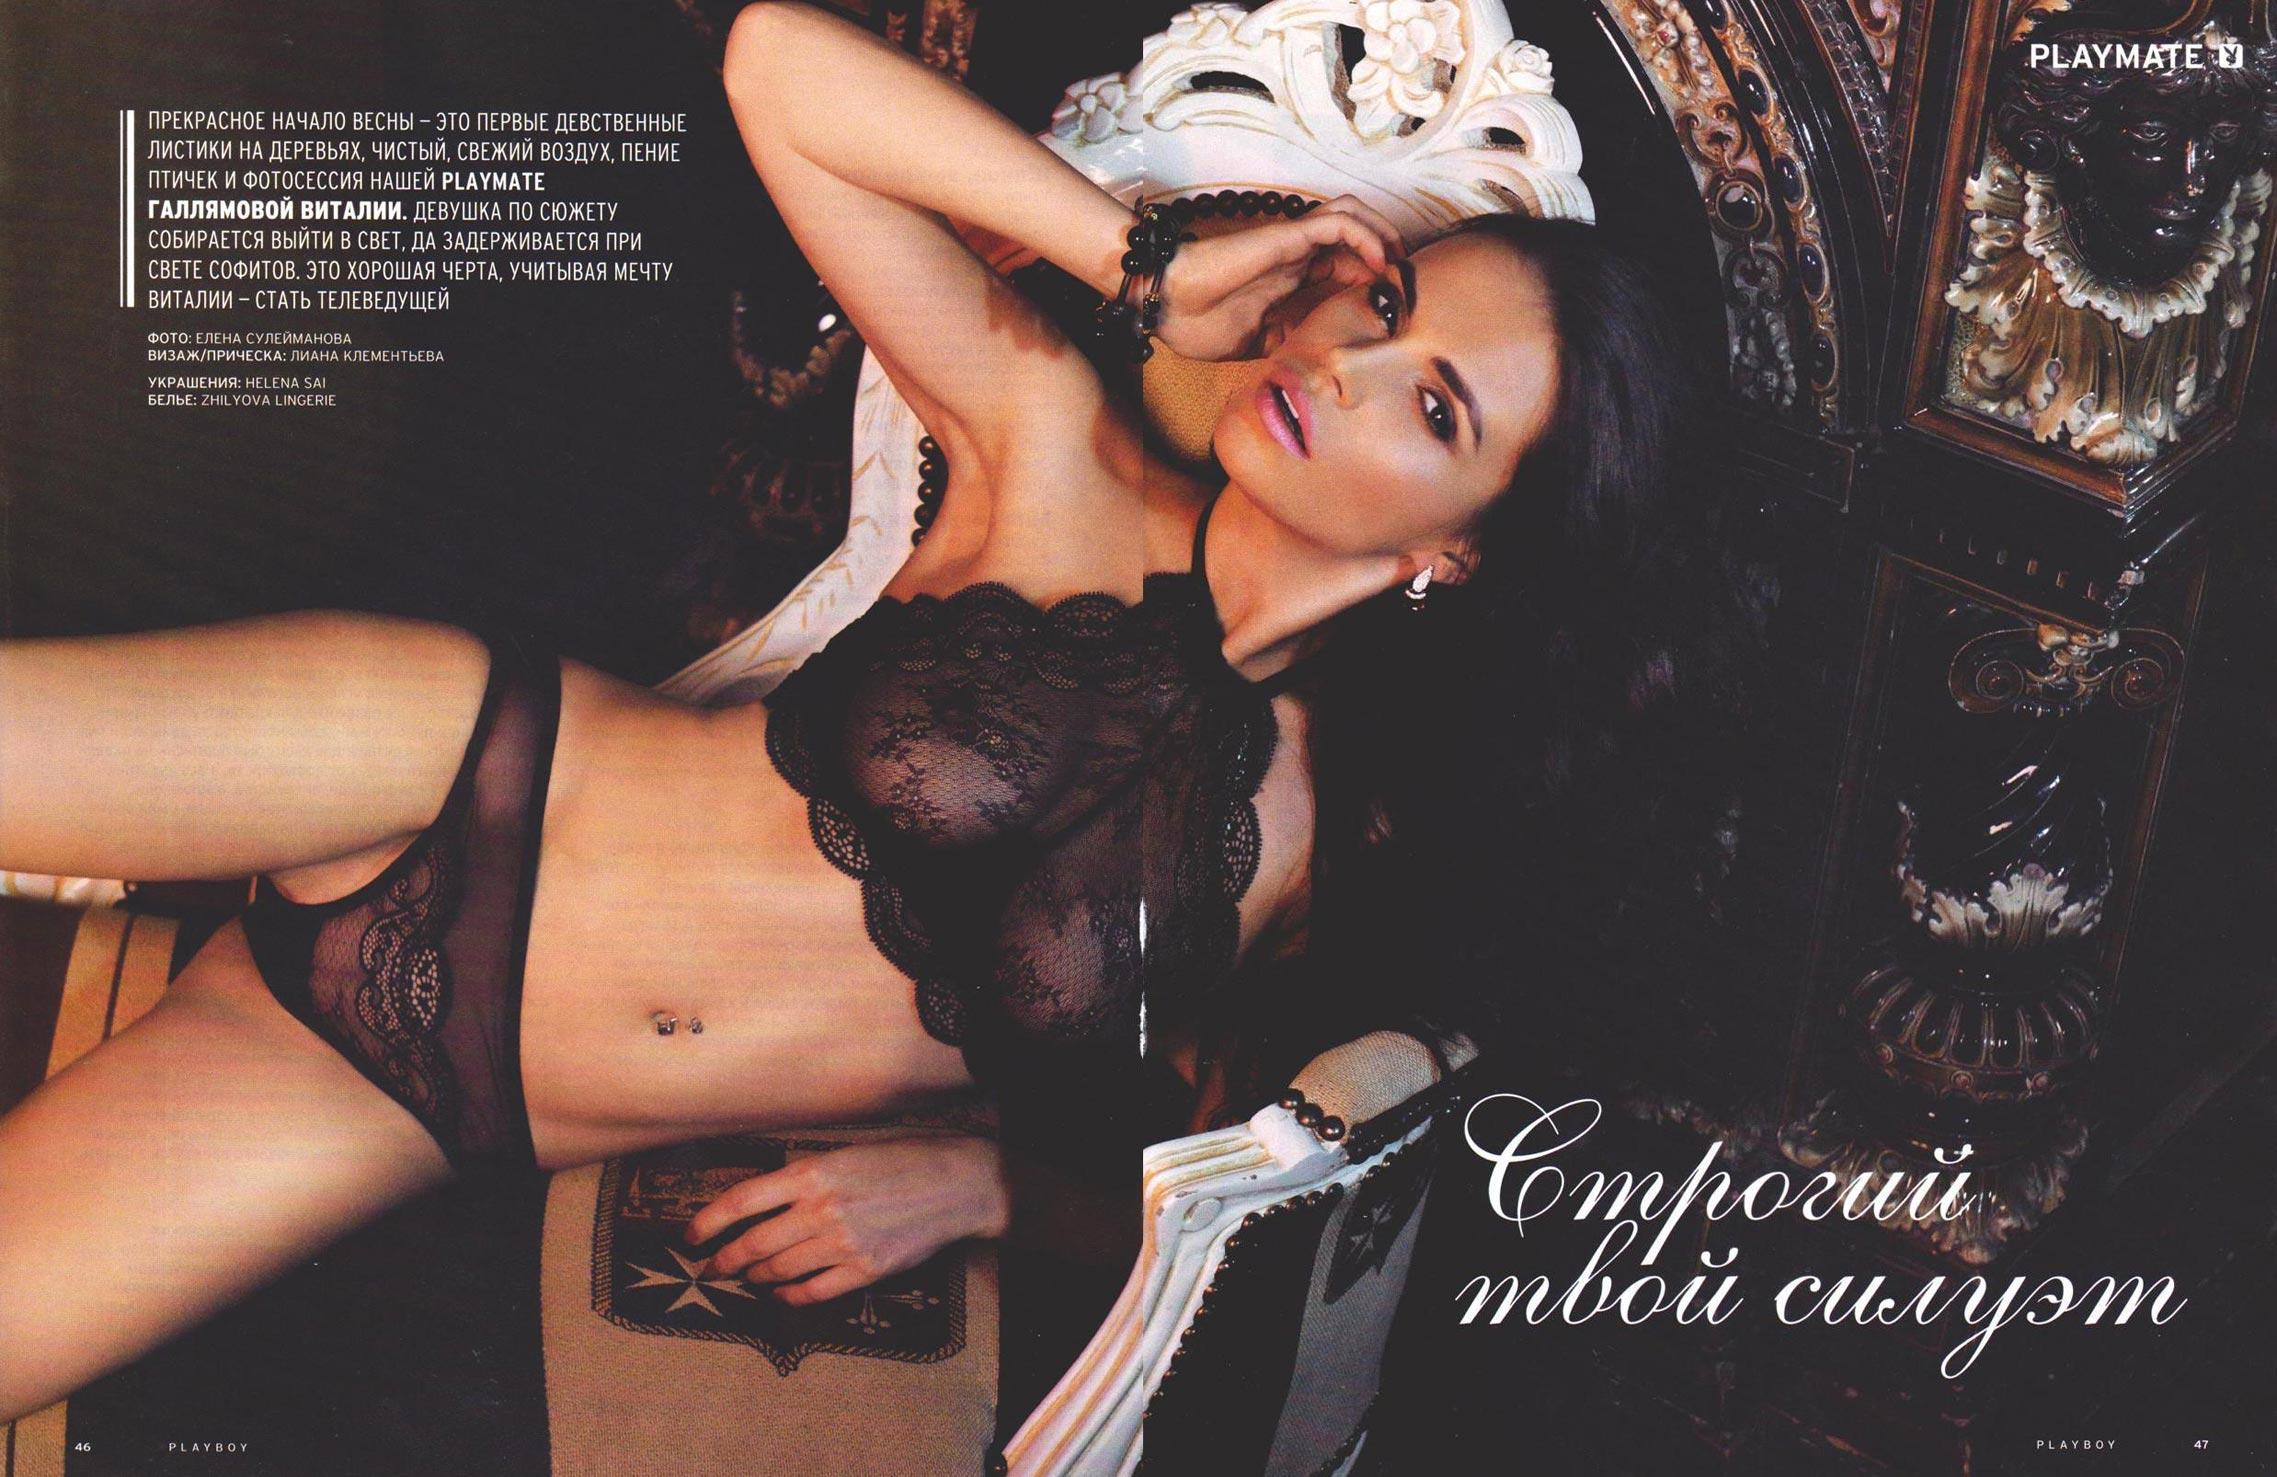 Виталия Галлямова - Девушка месяца Playboy Украина май-июнь 2016